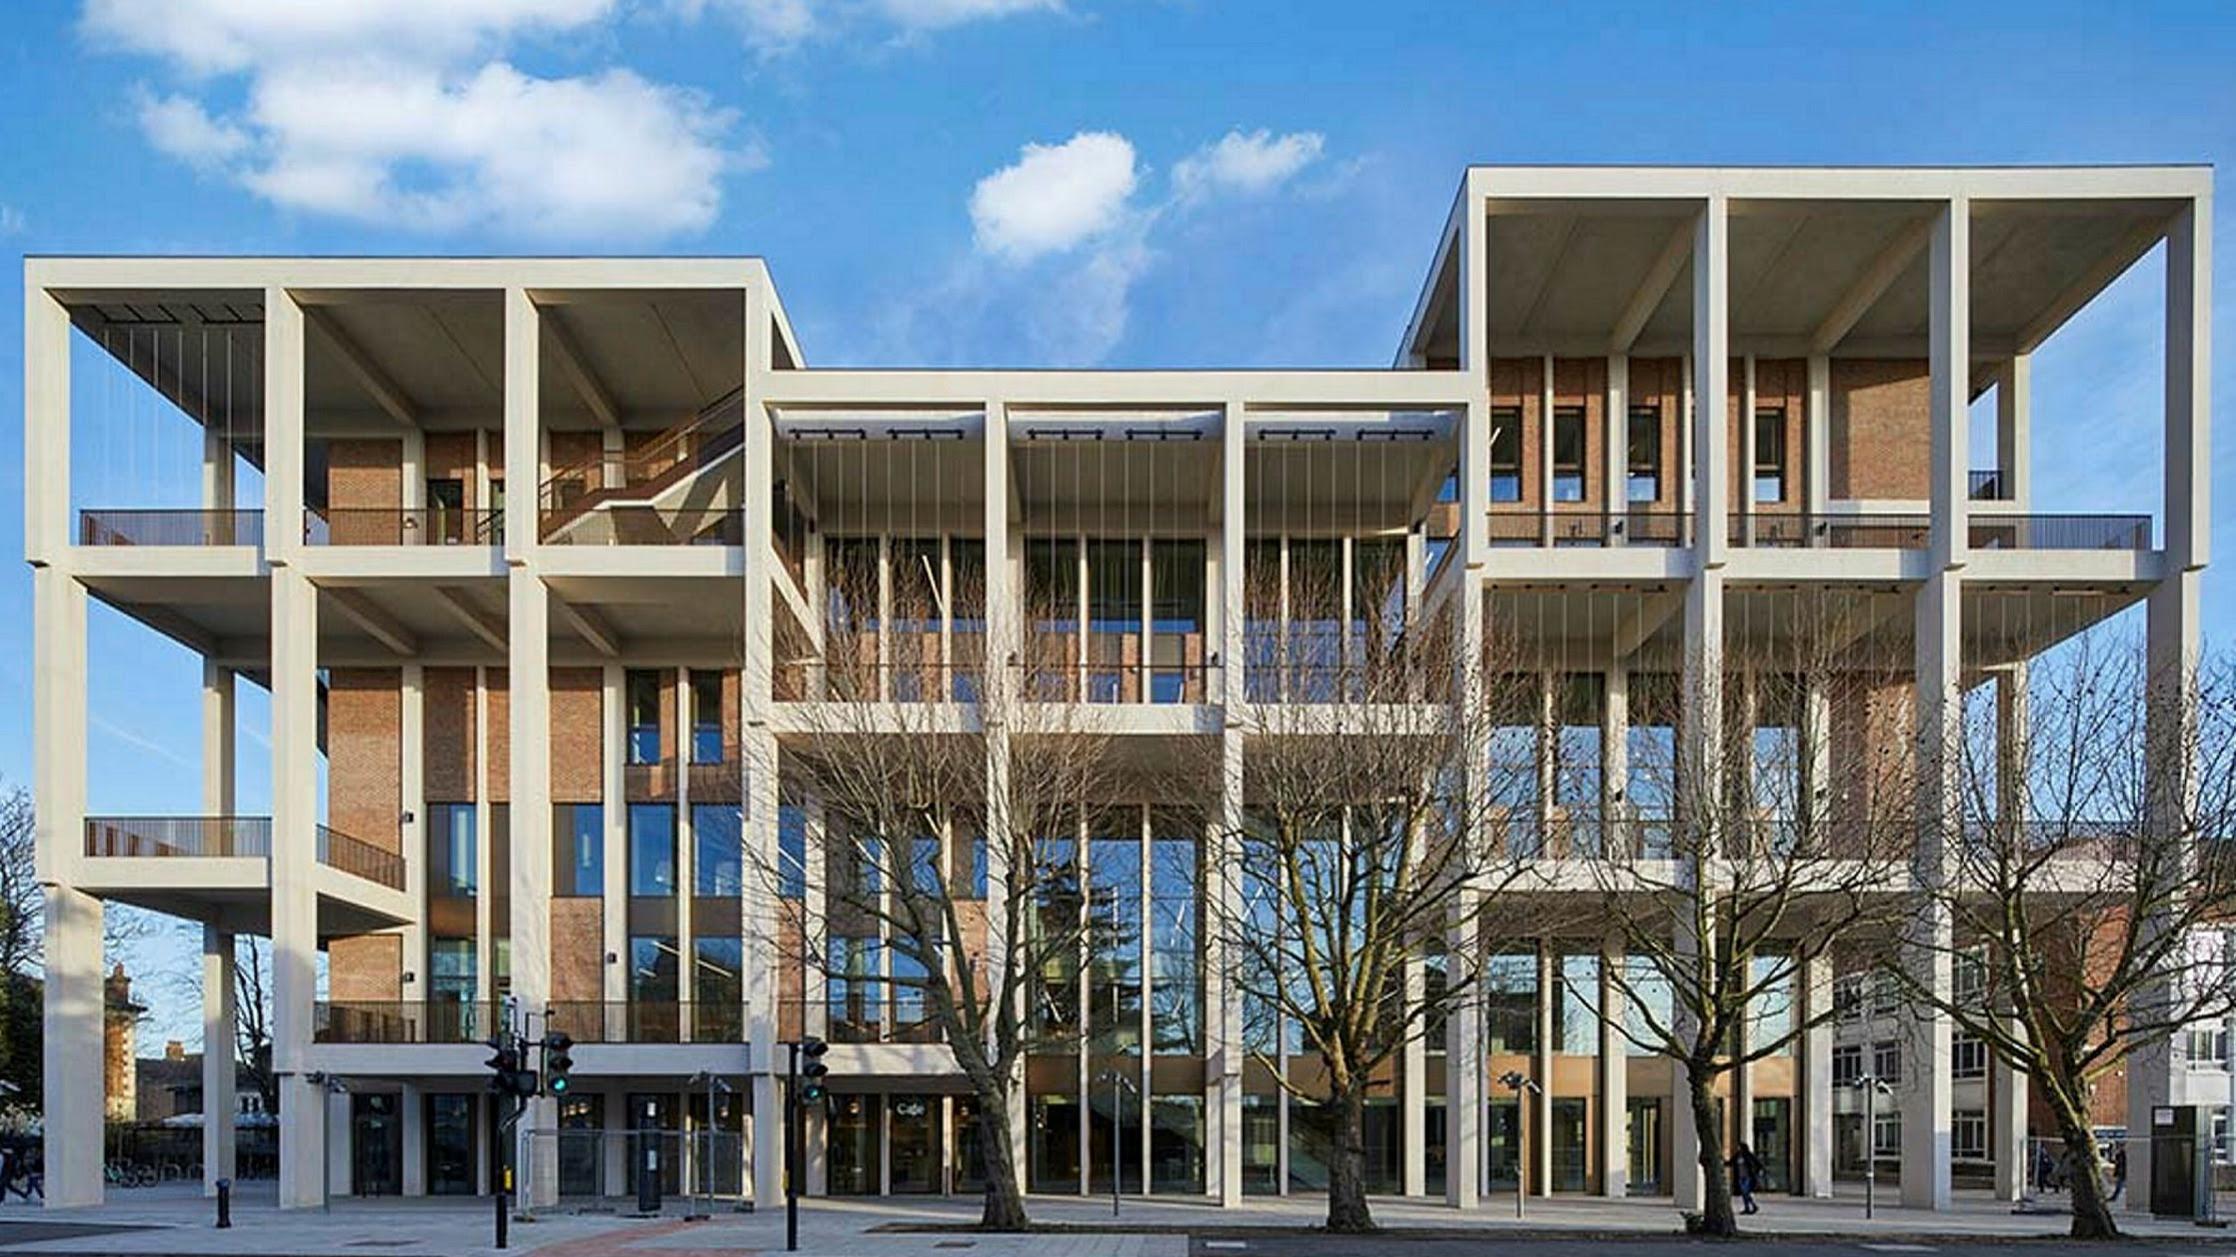 Kingston University Townhouse wins 2021 Stirling architecture prize